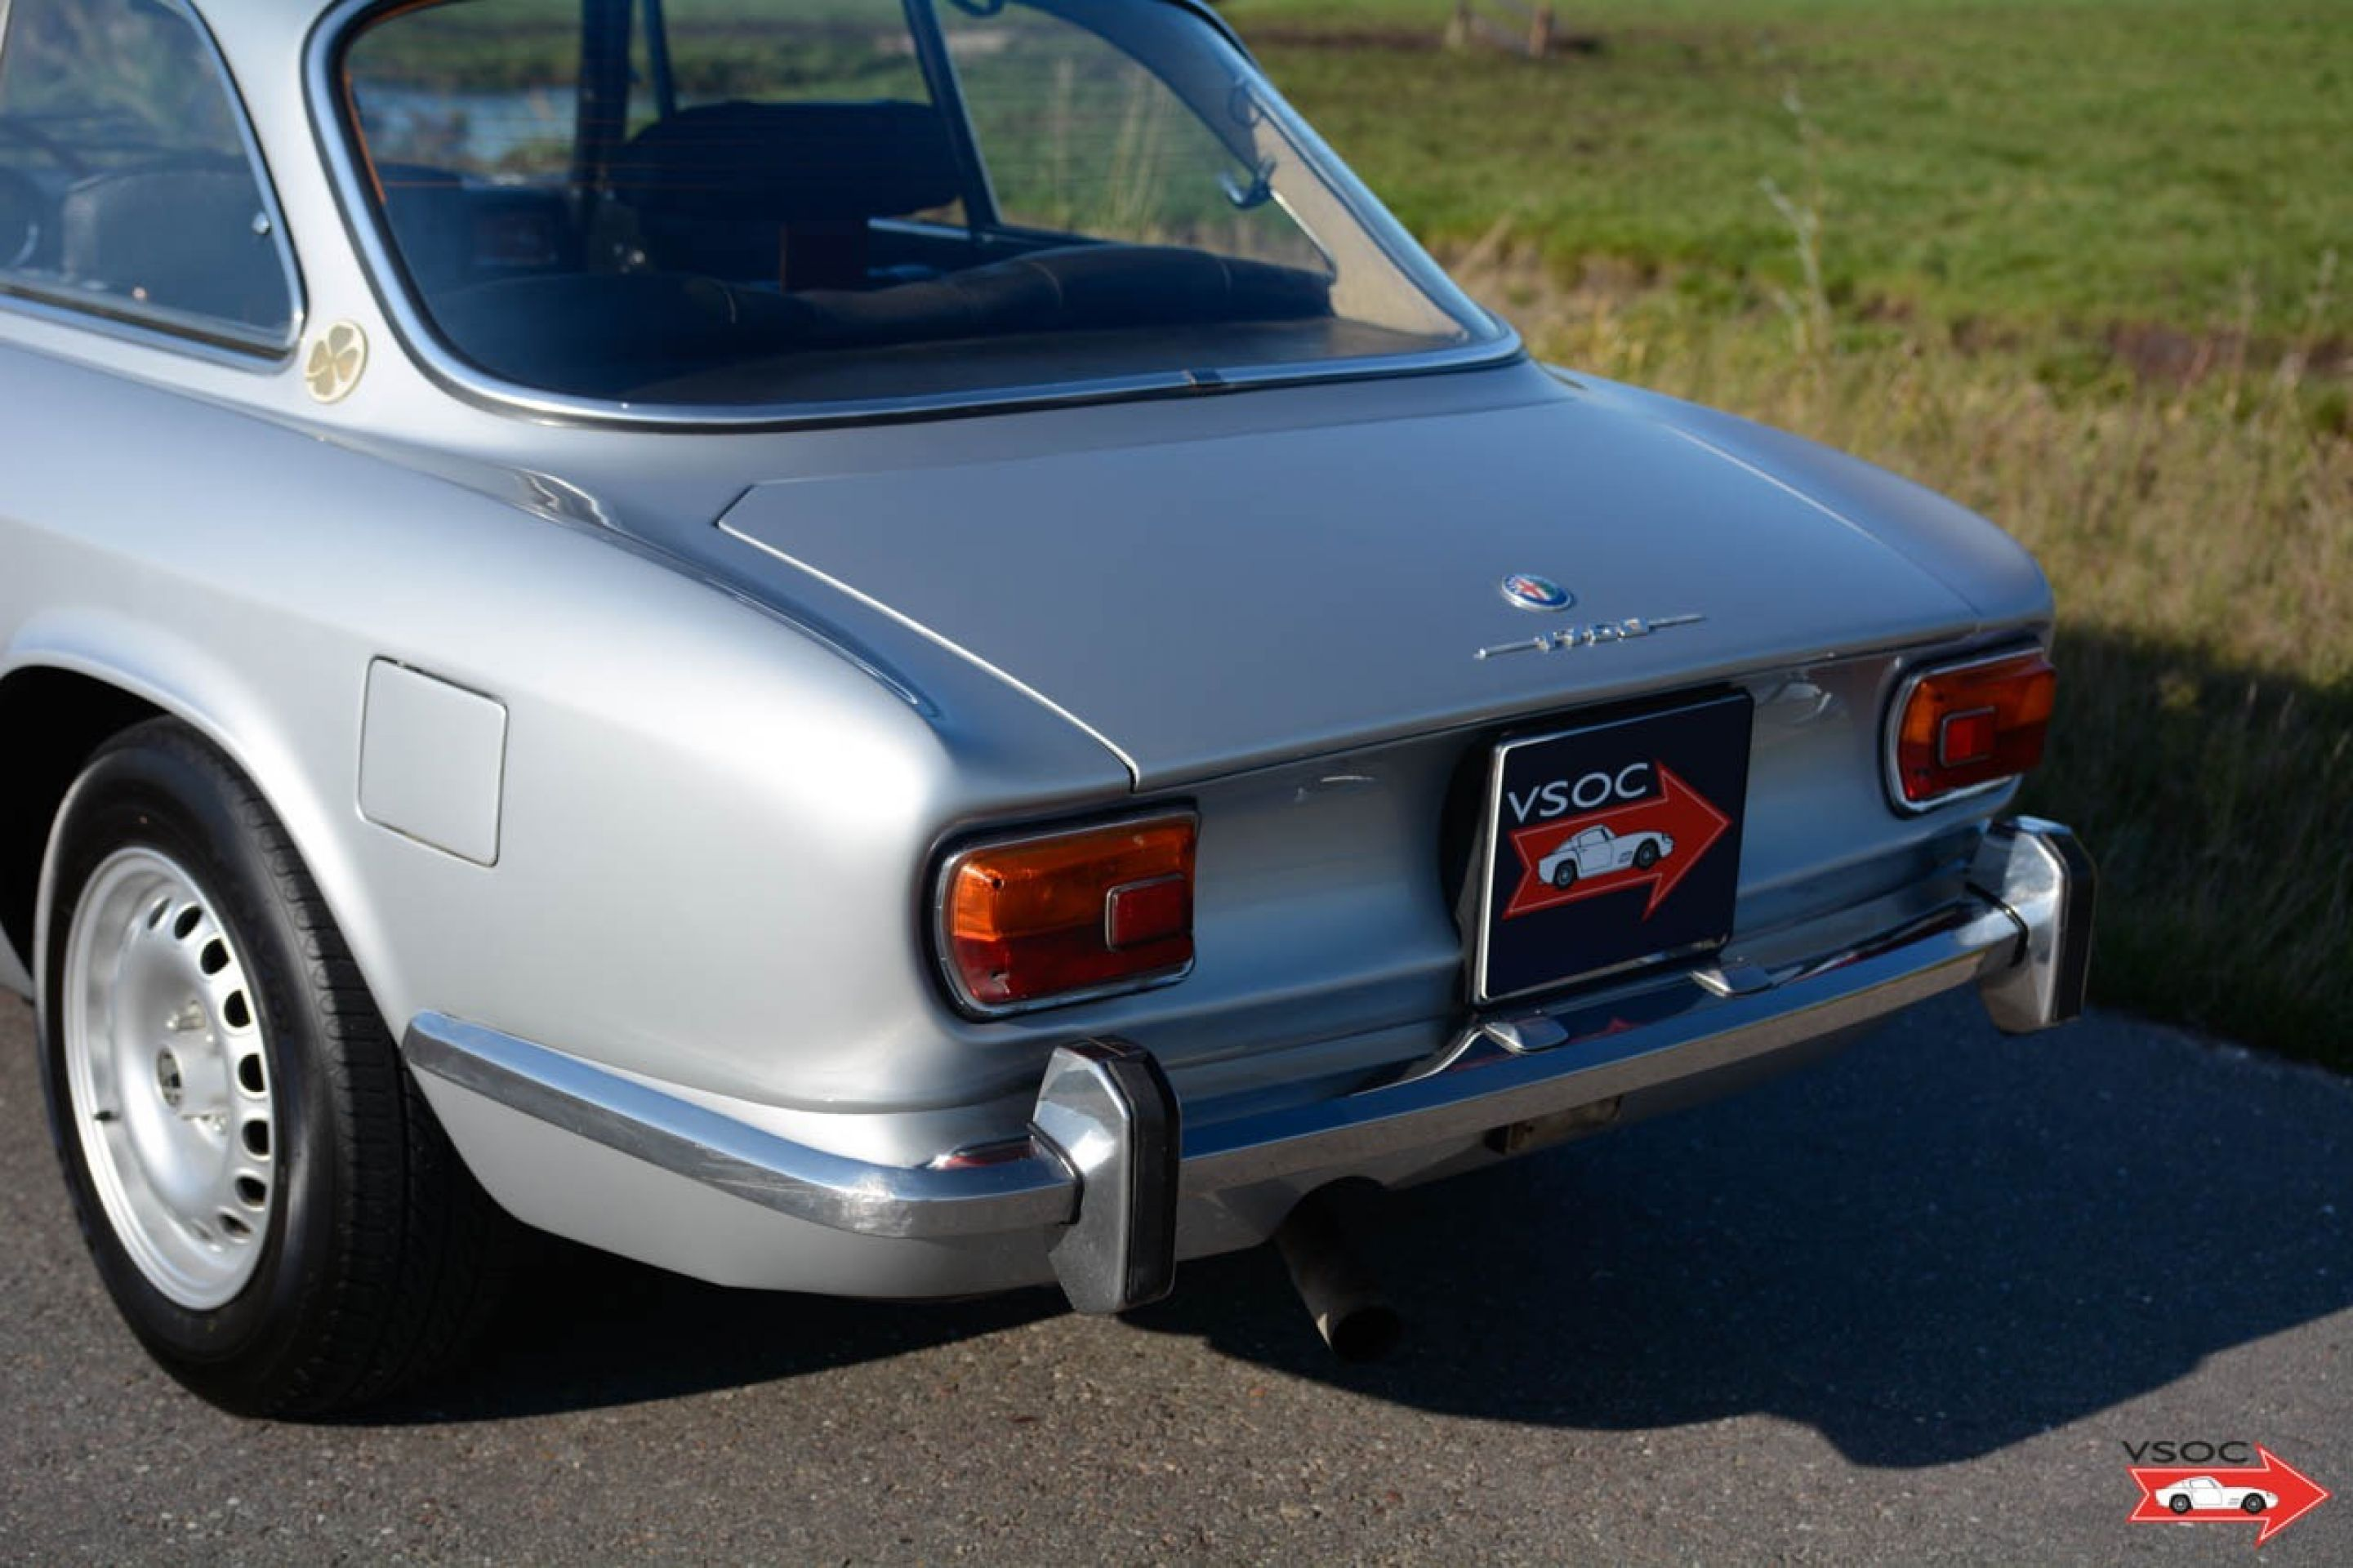 1970 Alfa Romeo 1750 GTV - Very nice original colour configuration